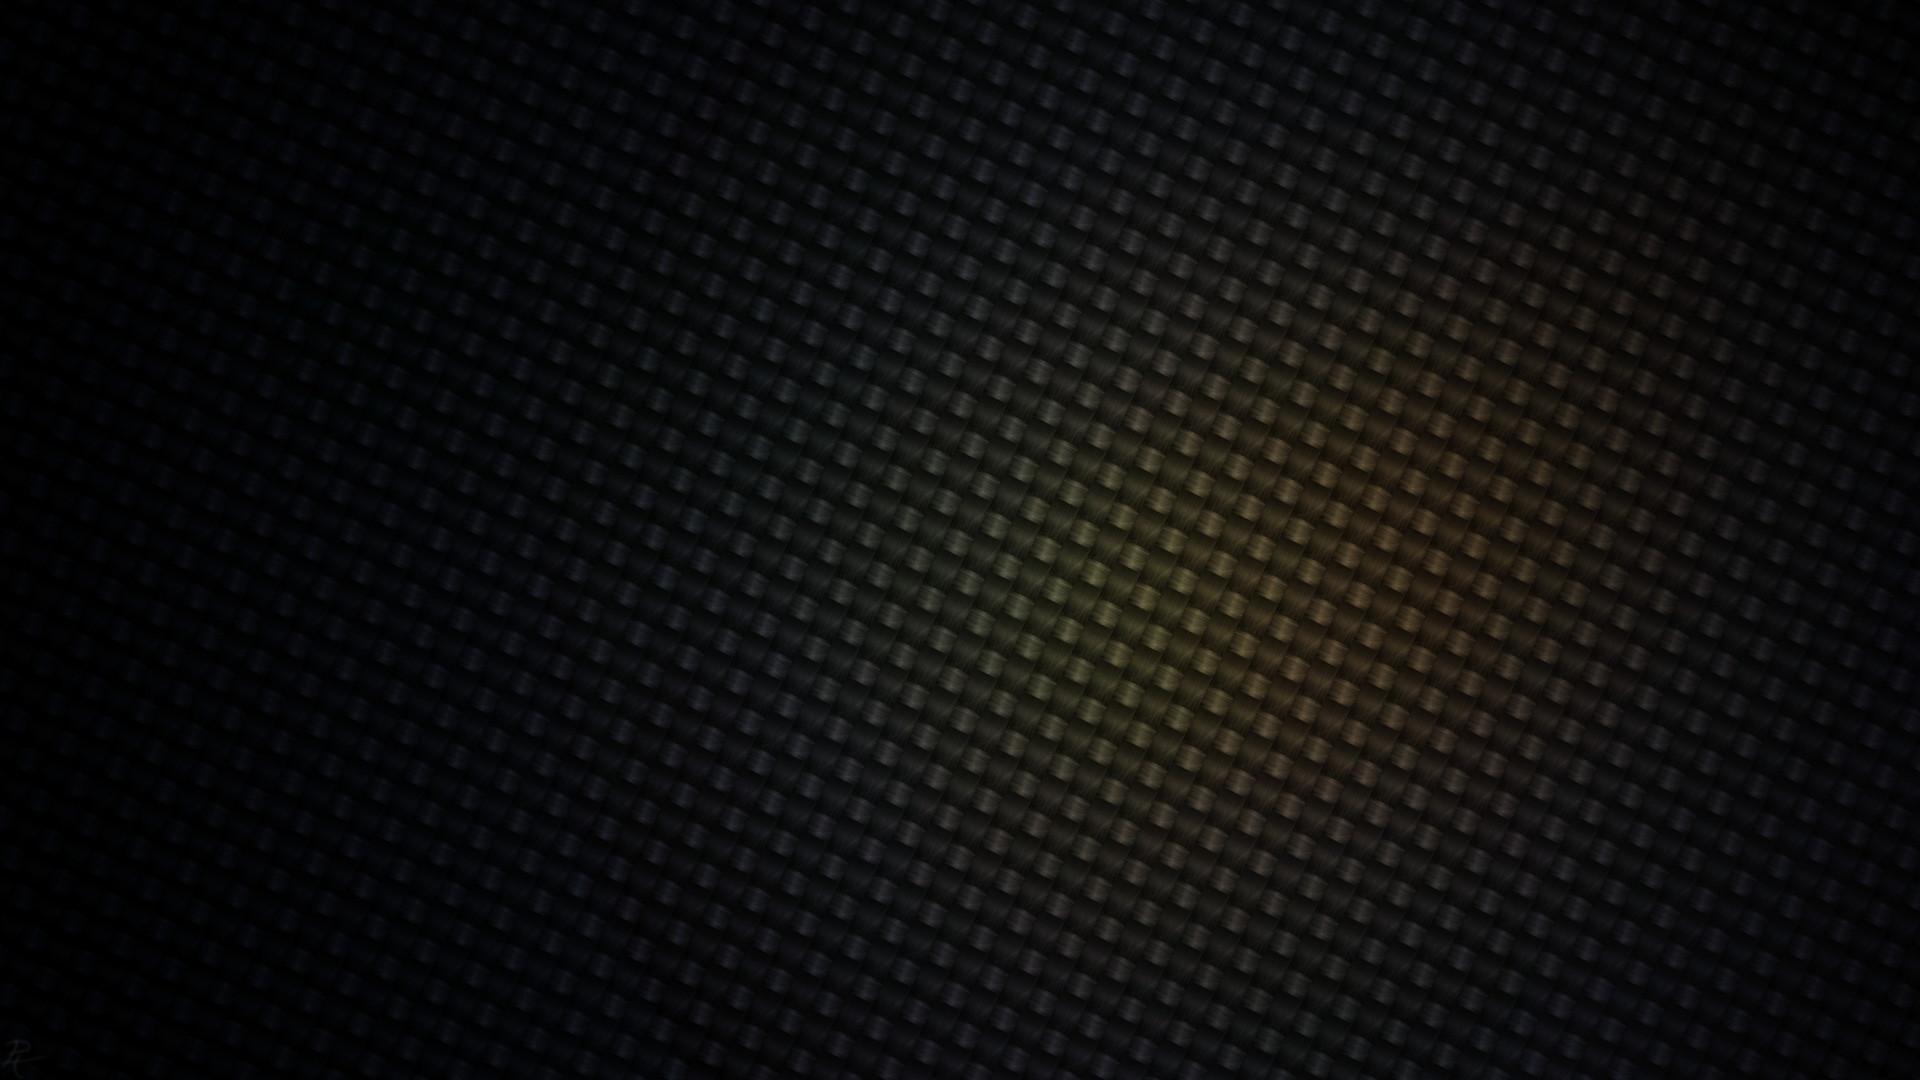 Carbon Fiber Background 22245 px ~ fond ecran